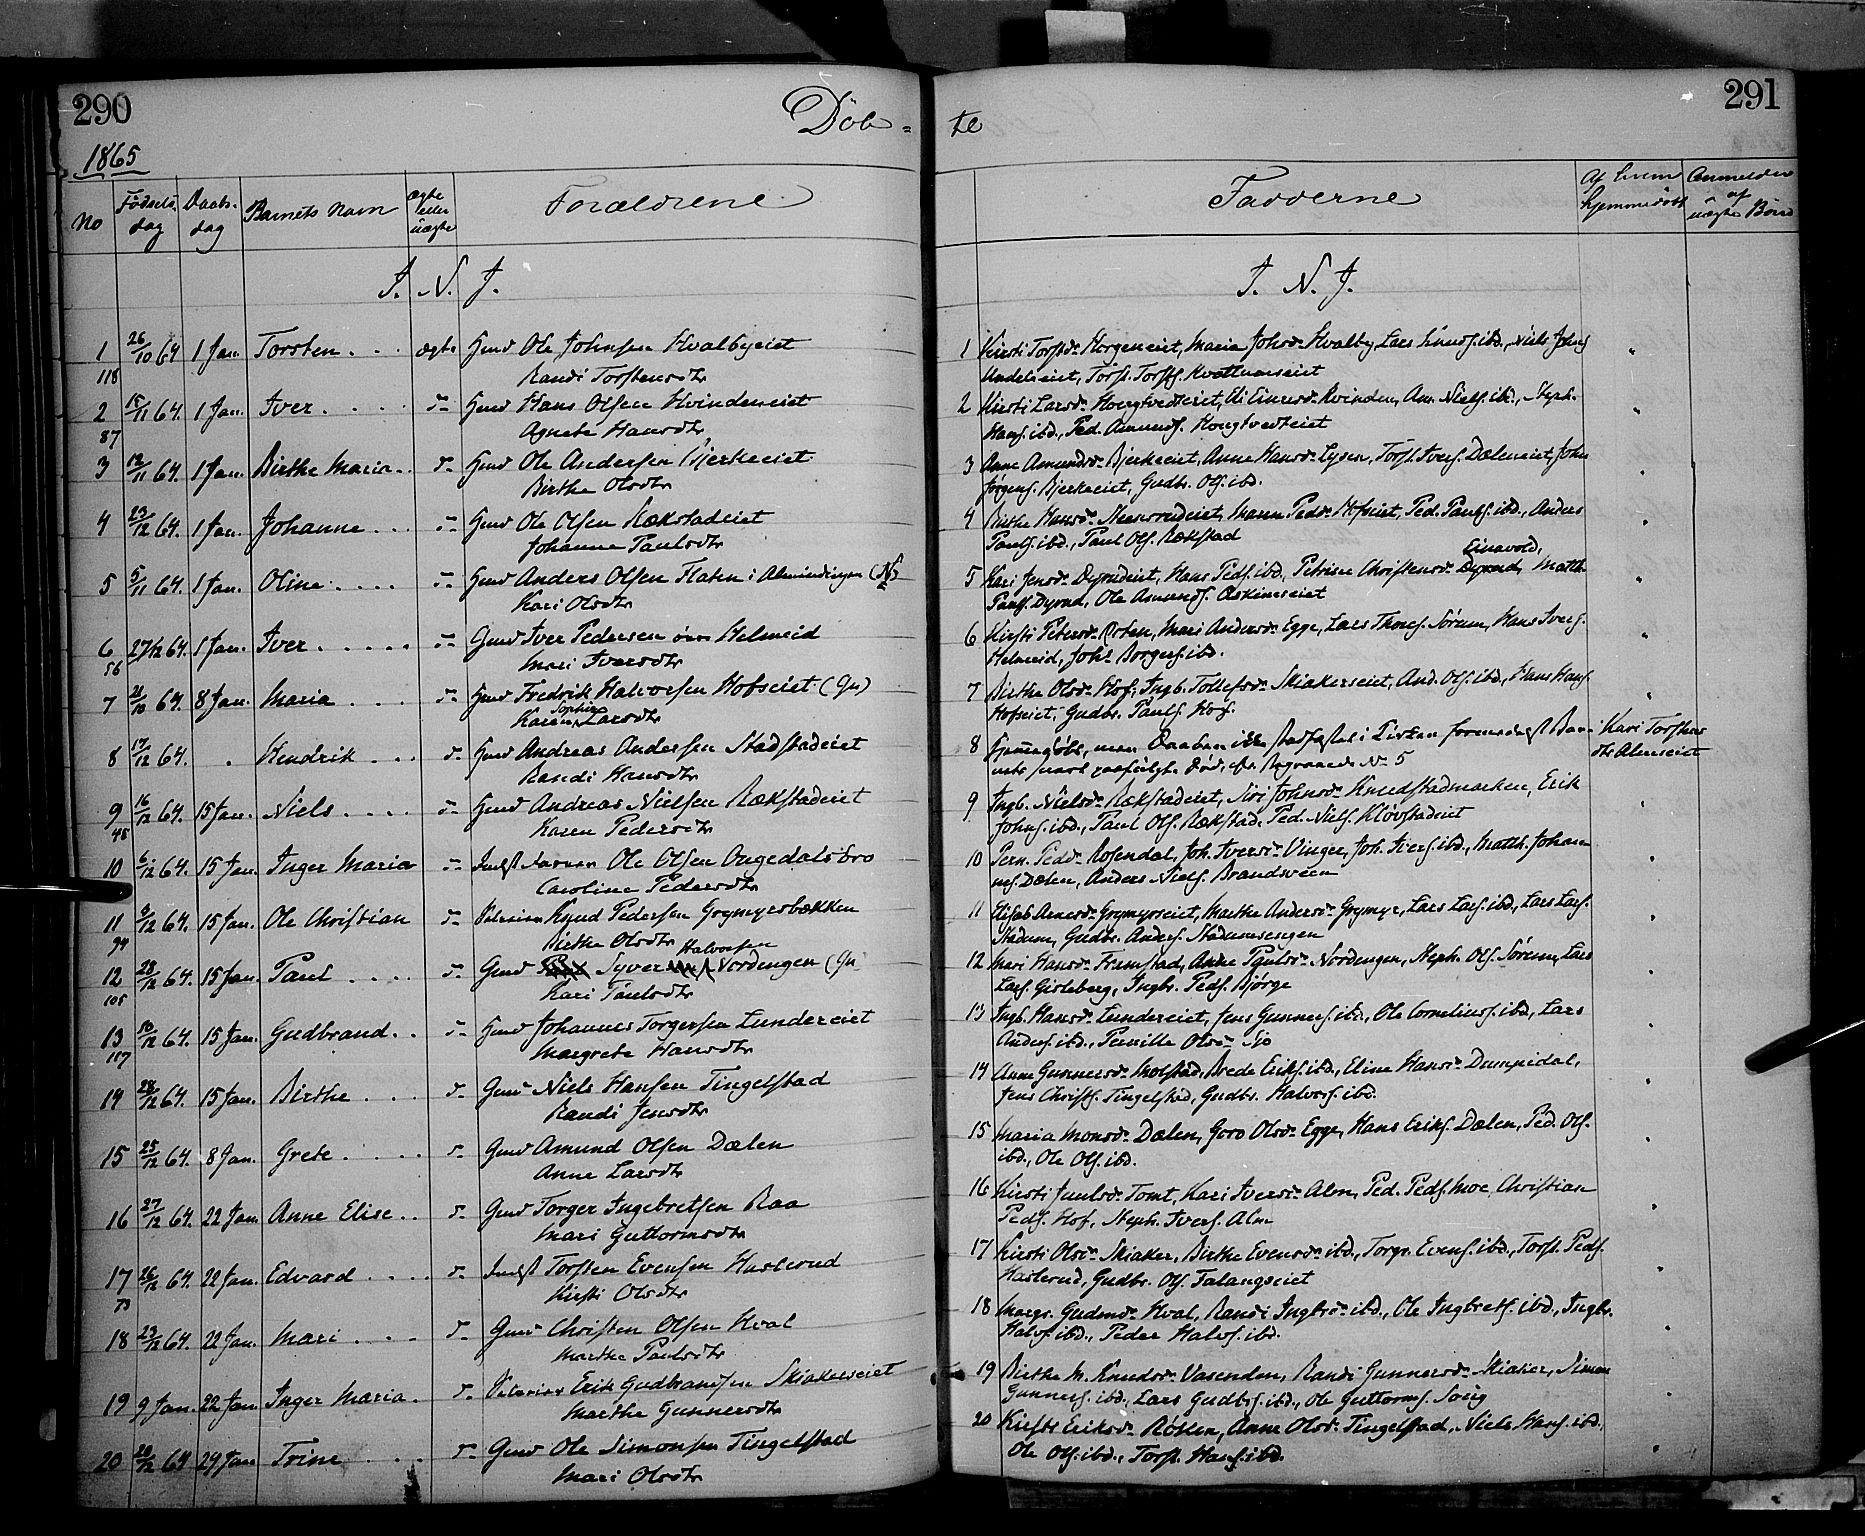 SAH, Gran prestekontor, Ministerialbok nr. 12, 1856-1874, s. 290-291